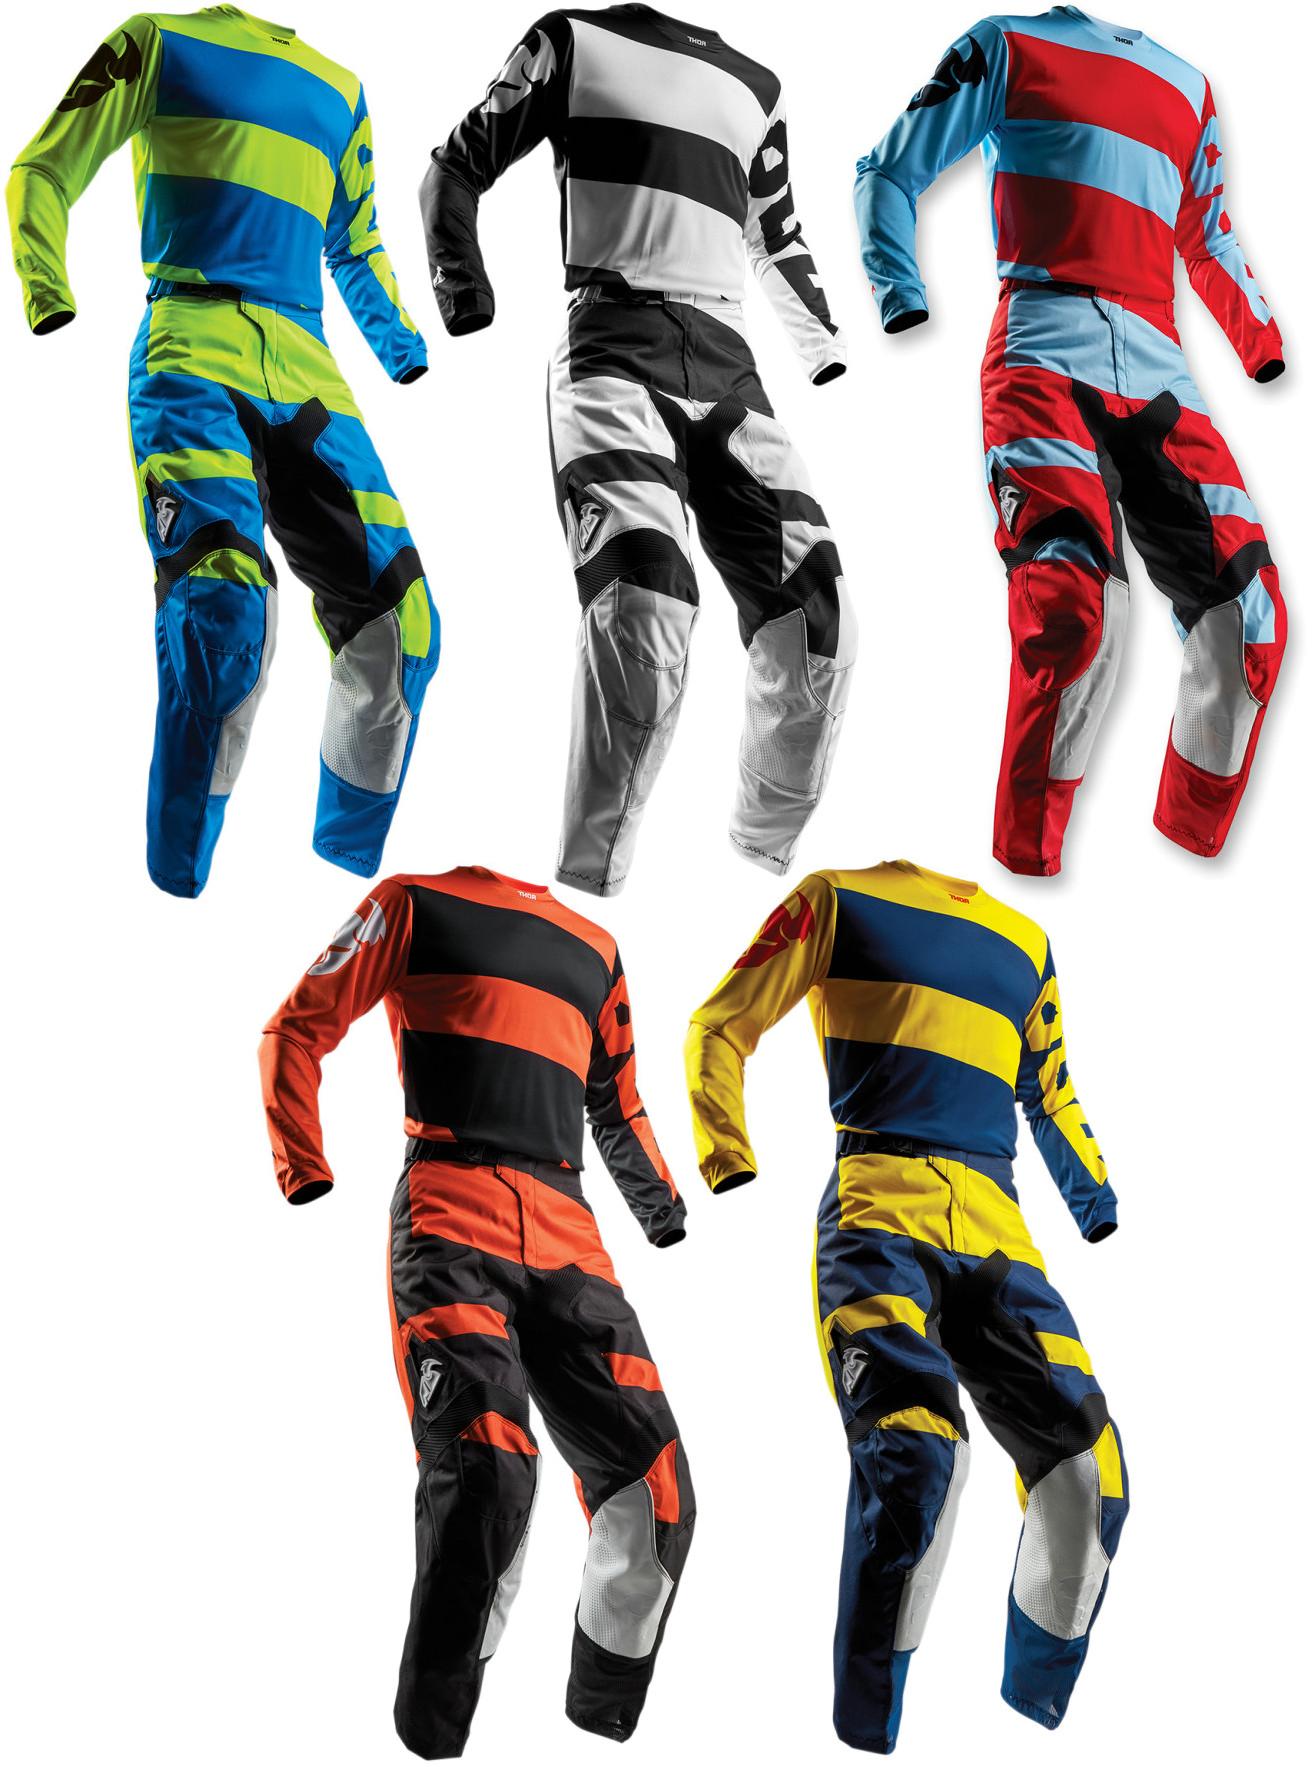 Thor Mens /& Youth Pulse Level Dirt Bike Jersey /& Pants Kit MX ATV Offroad 2018